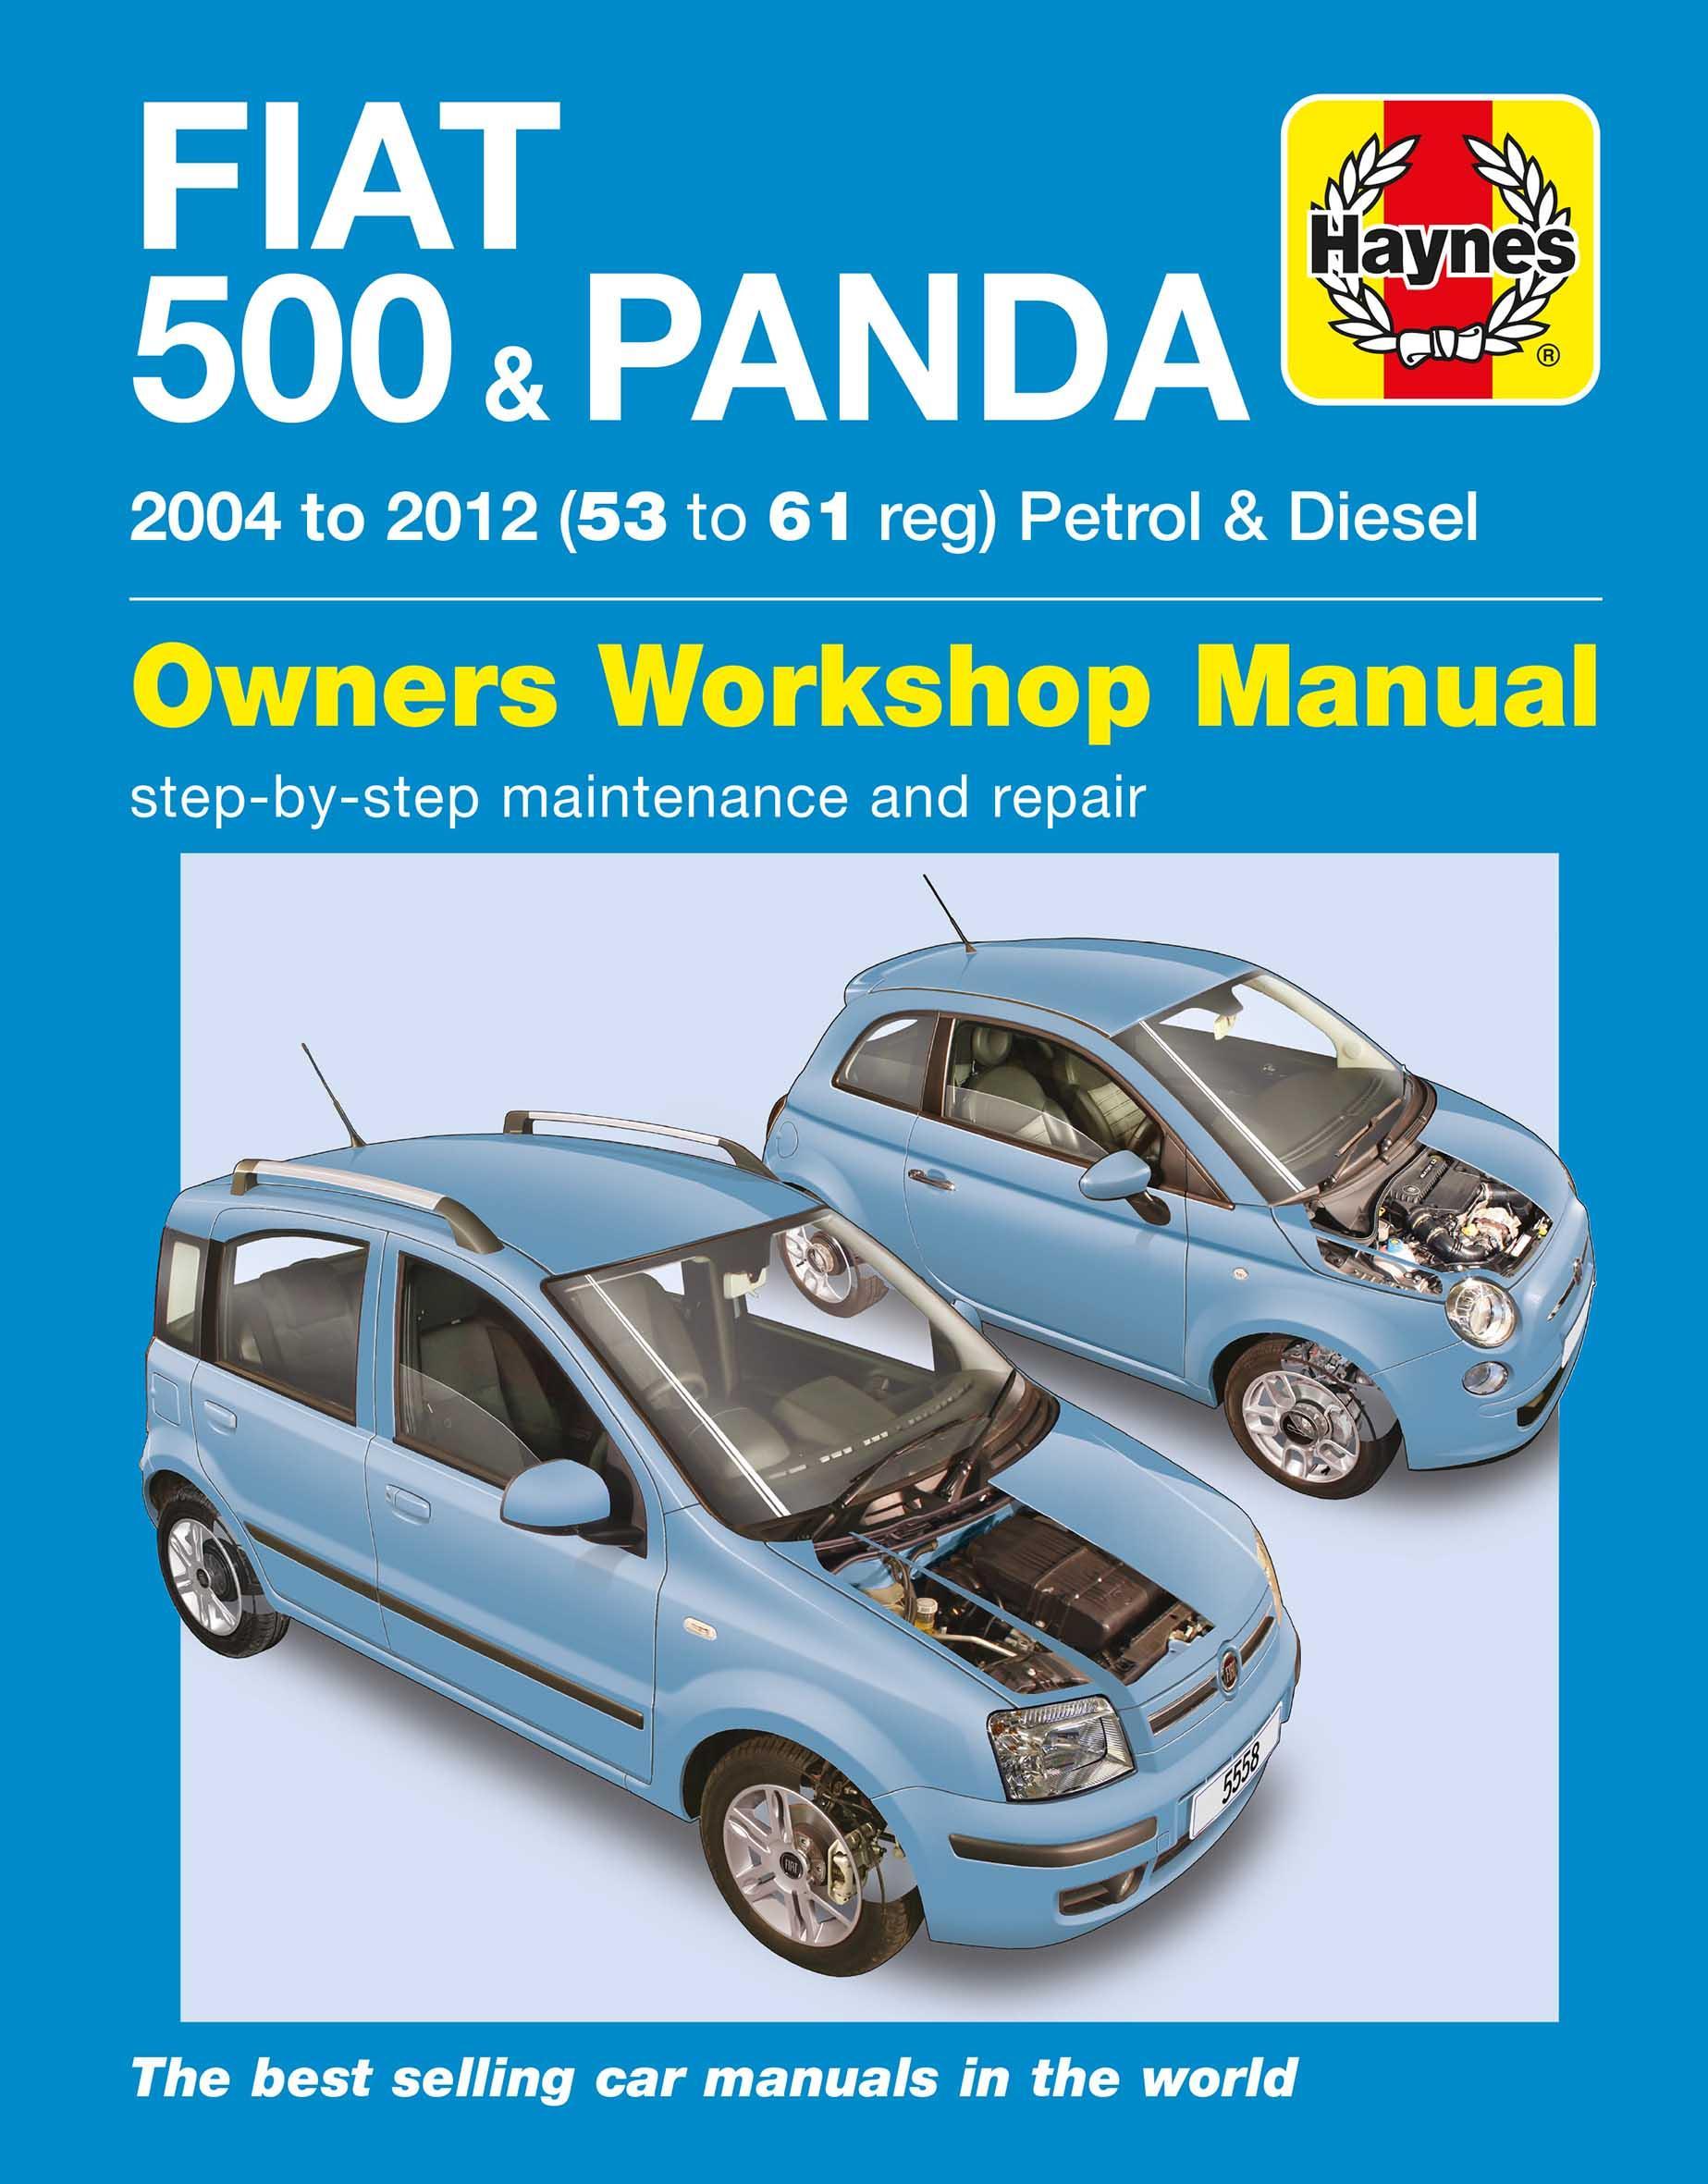 haynes fiat 500 panda 04 12 m rh halfords com fiat panda workshop manual 2004 fiat panda workshop manual pdf